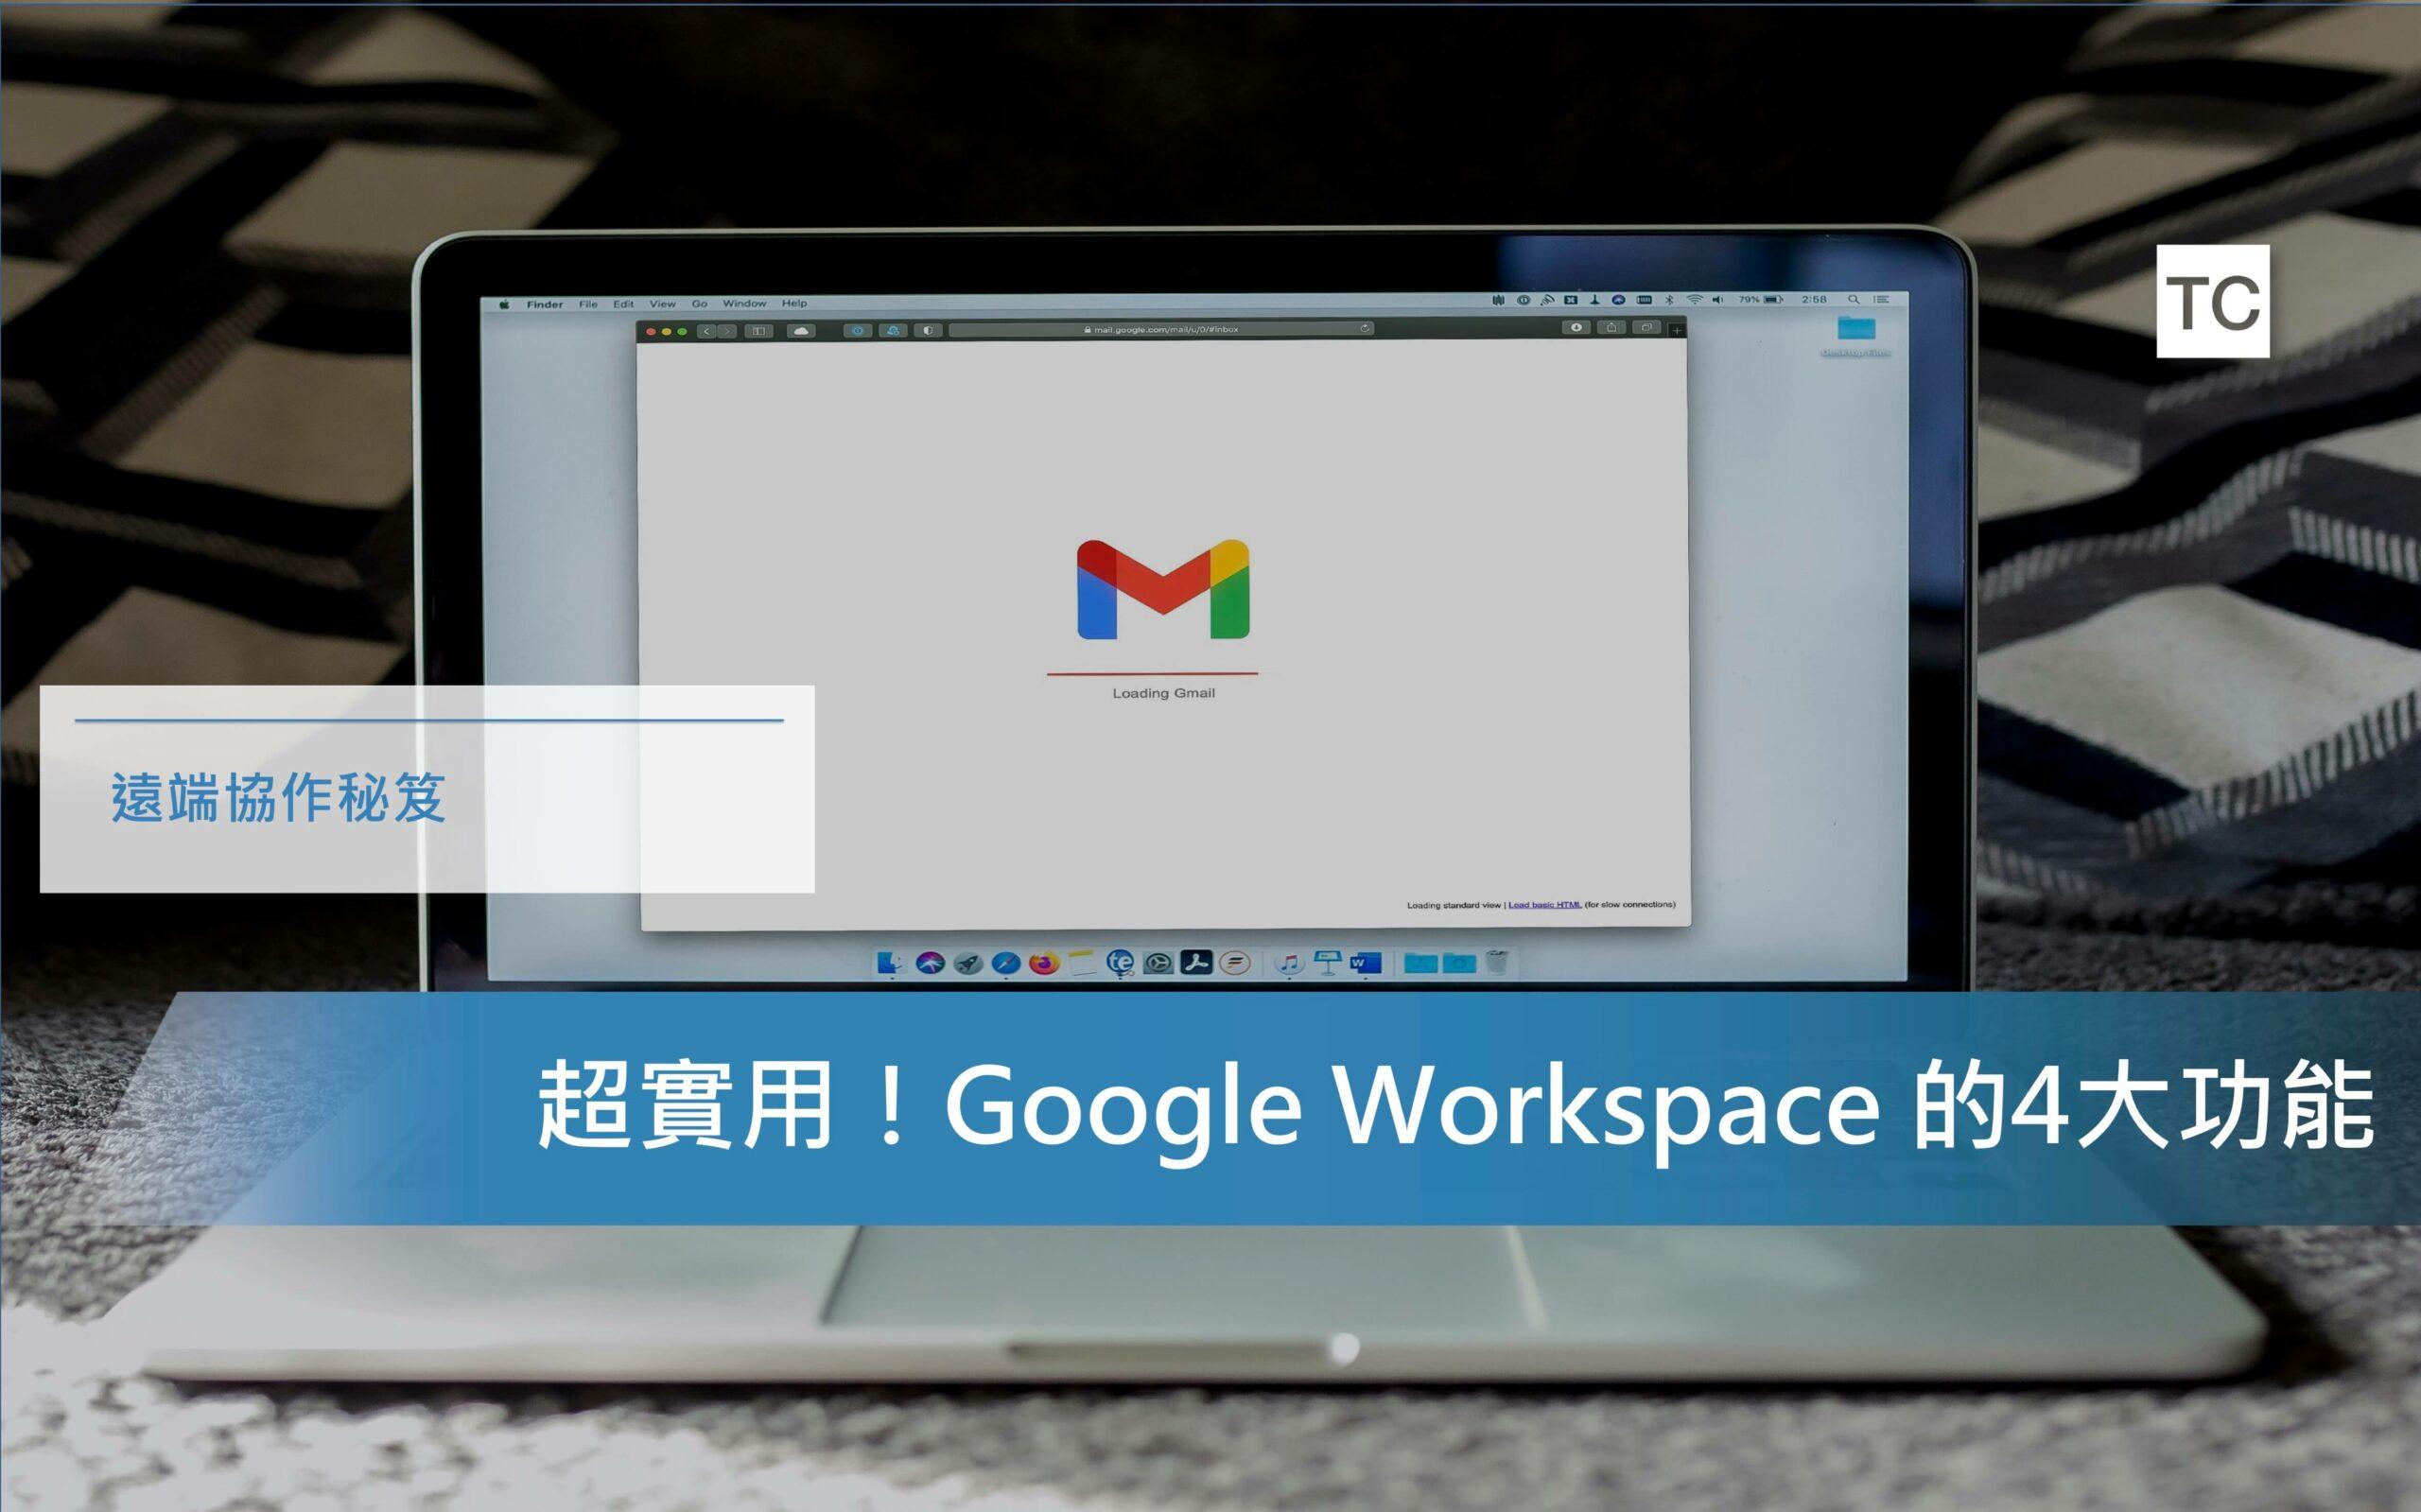 Google Workspace|超實用!Google Workspace 不可不知的 4 大功能